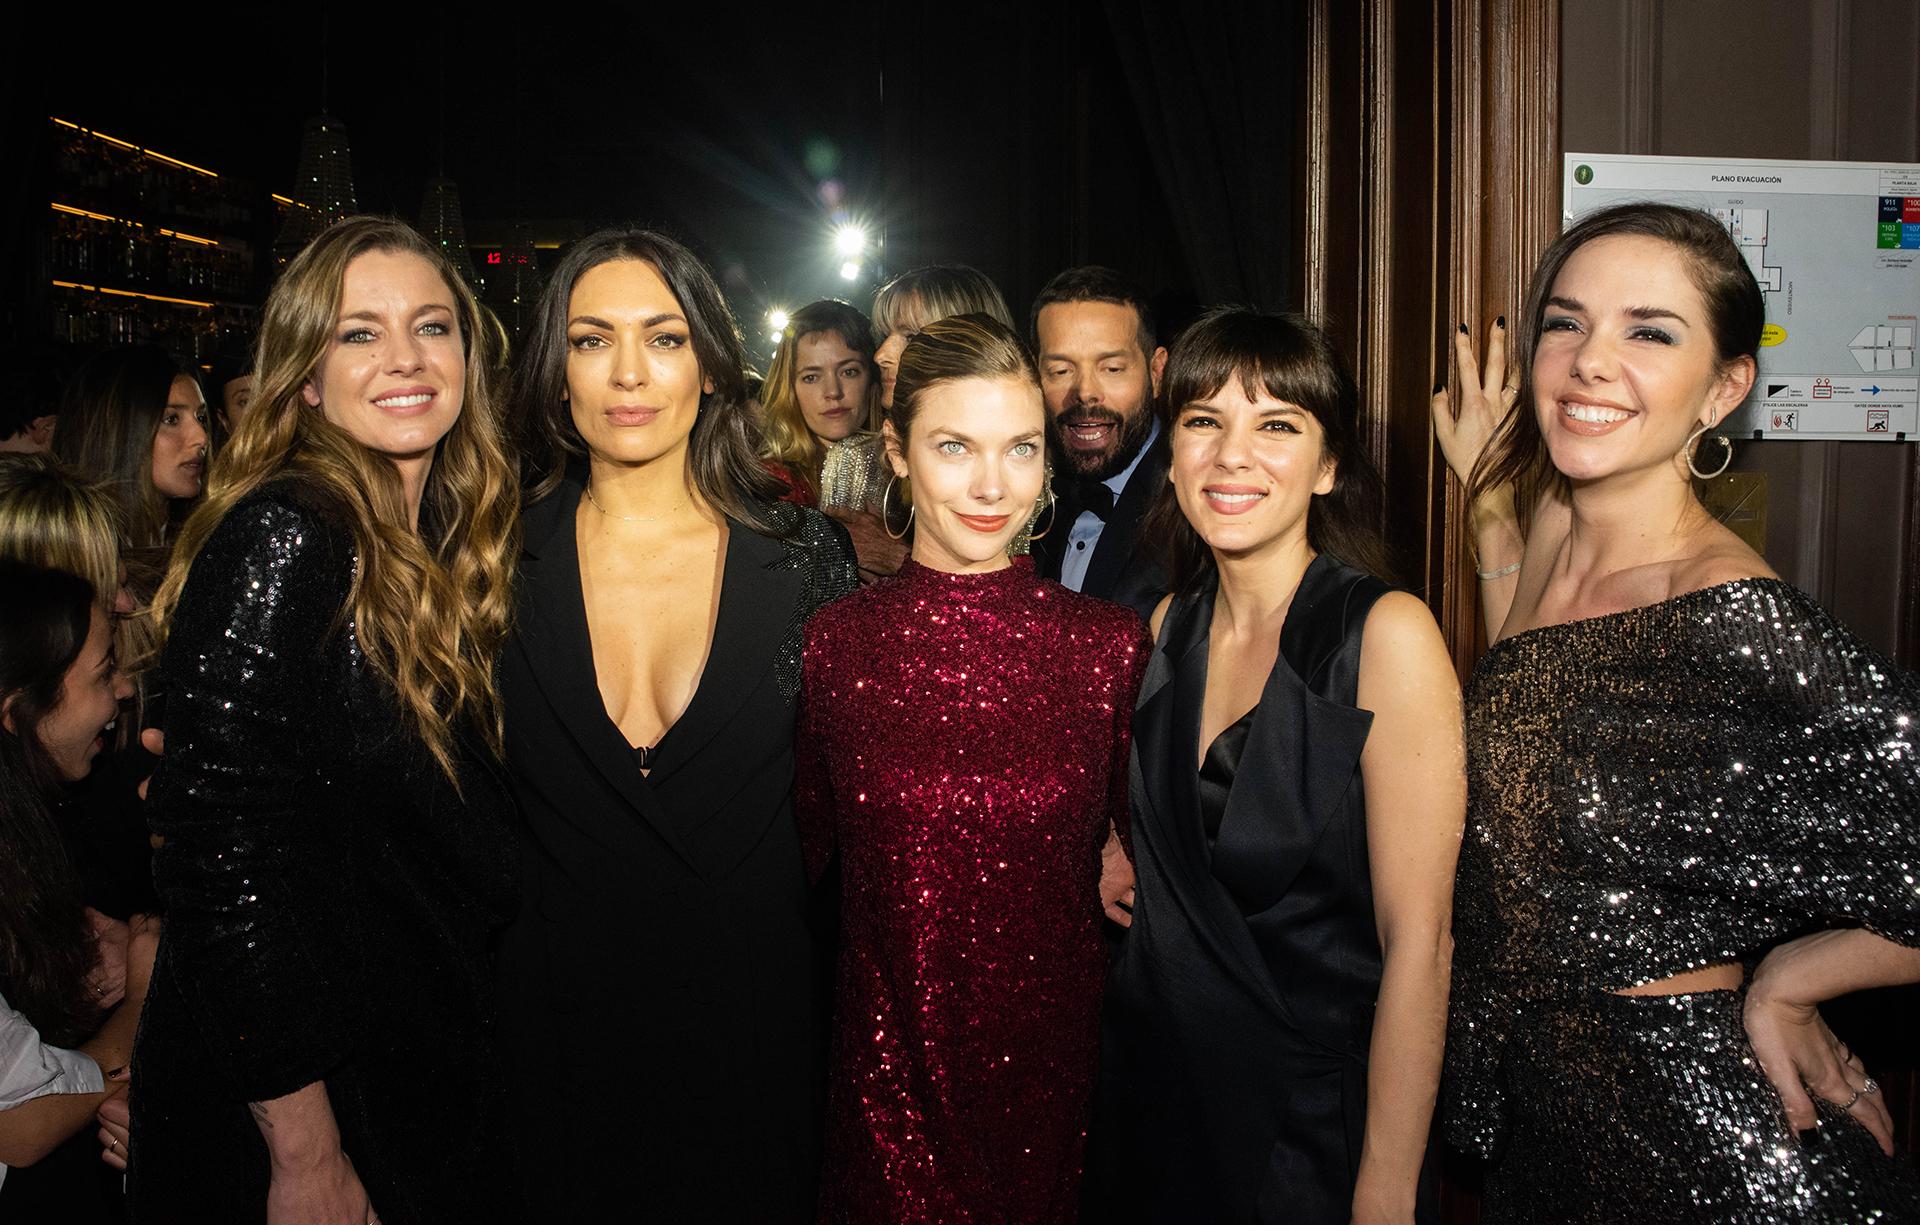 Gege Neumann, Maria Gorof, Laura Laprida, Gimena Accardi y Julieta Nair Calvo